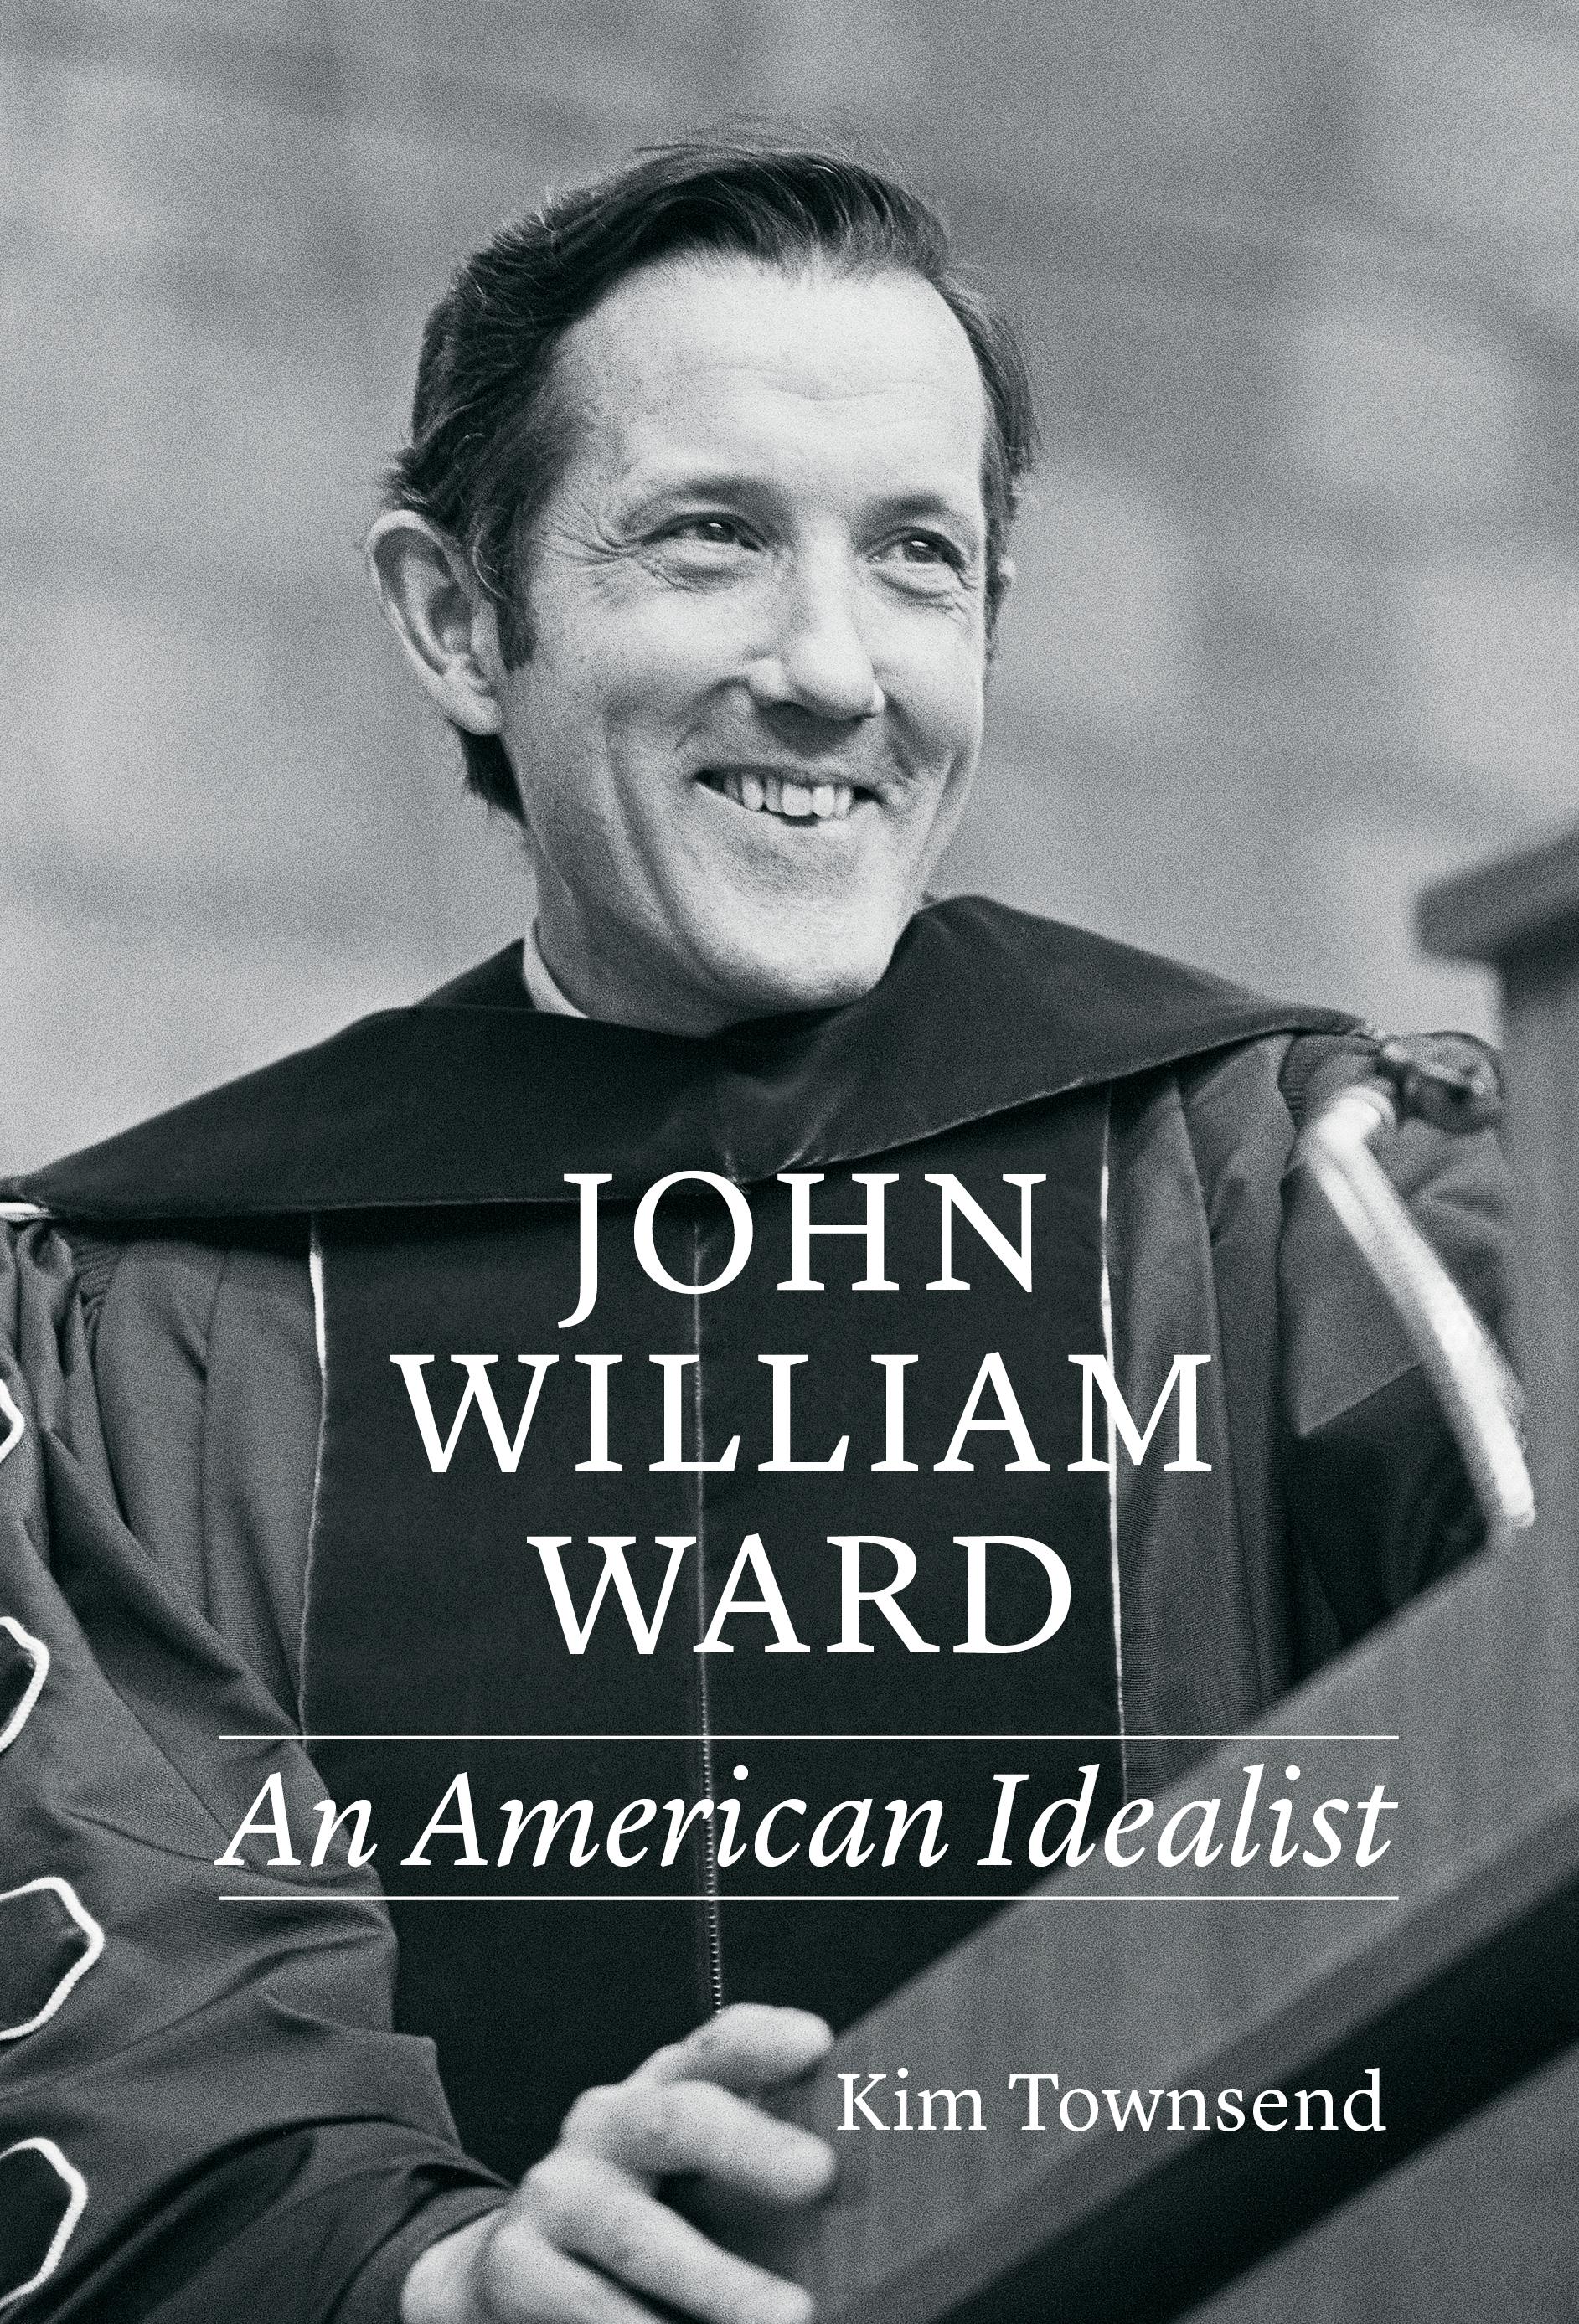 John William Ward cover.jpg